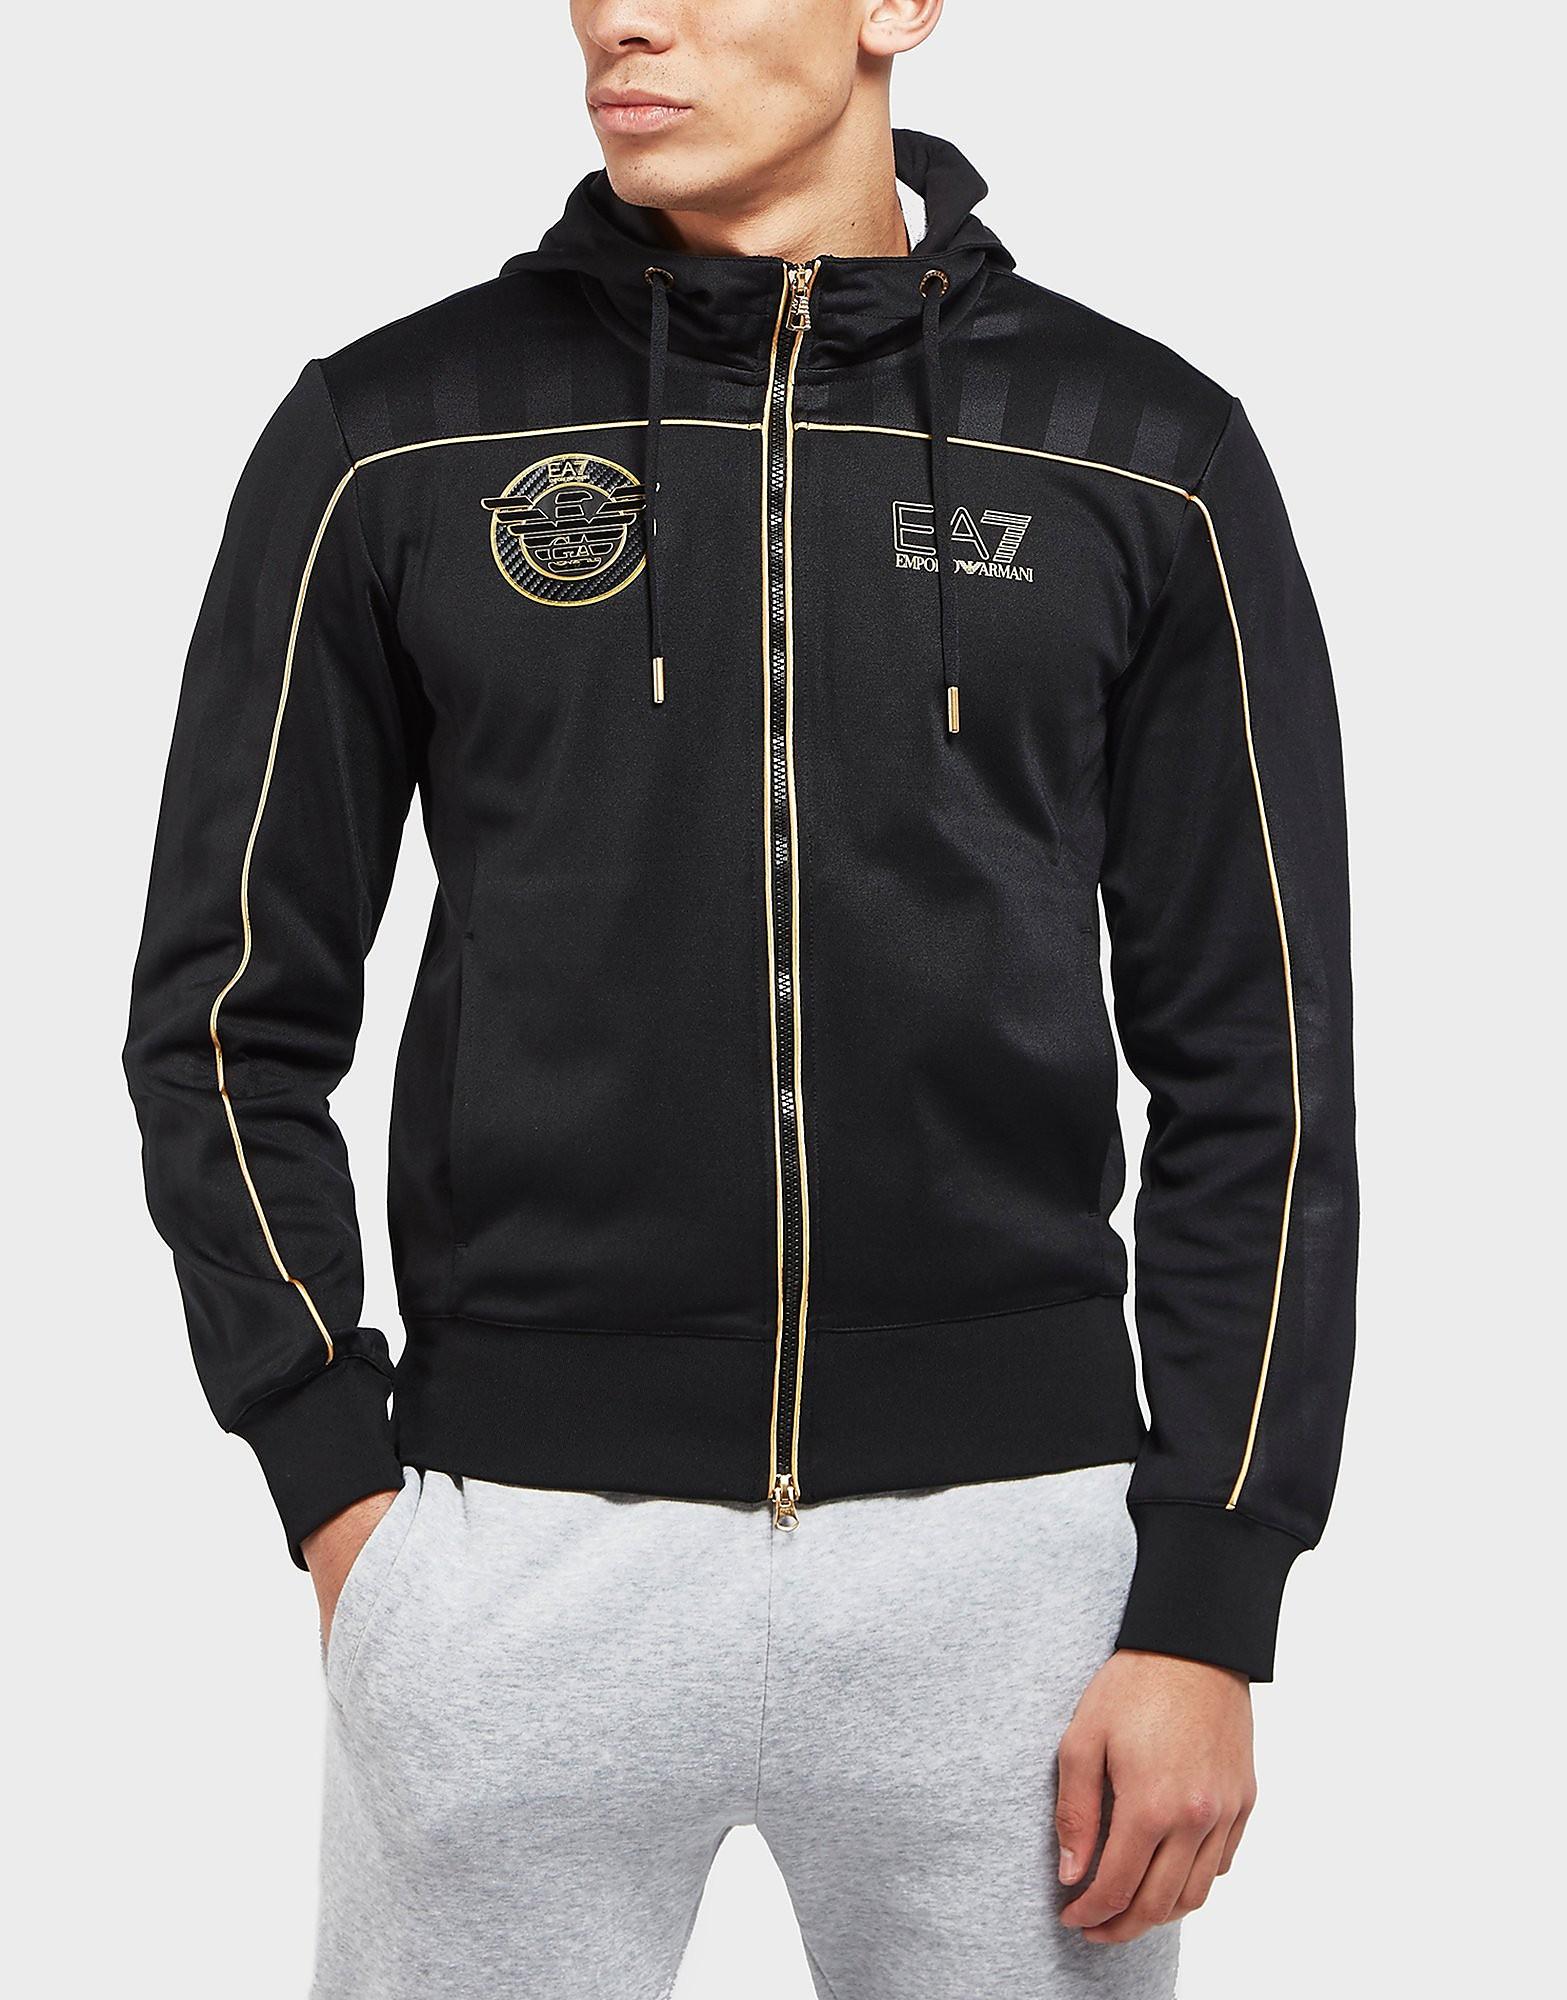 Emporio Armani EA7 Soccer Full Zip Hoodie